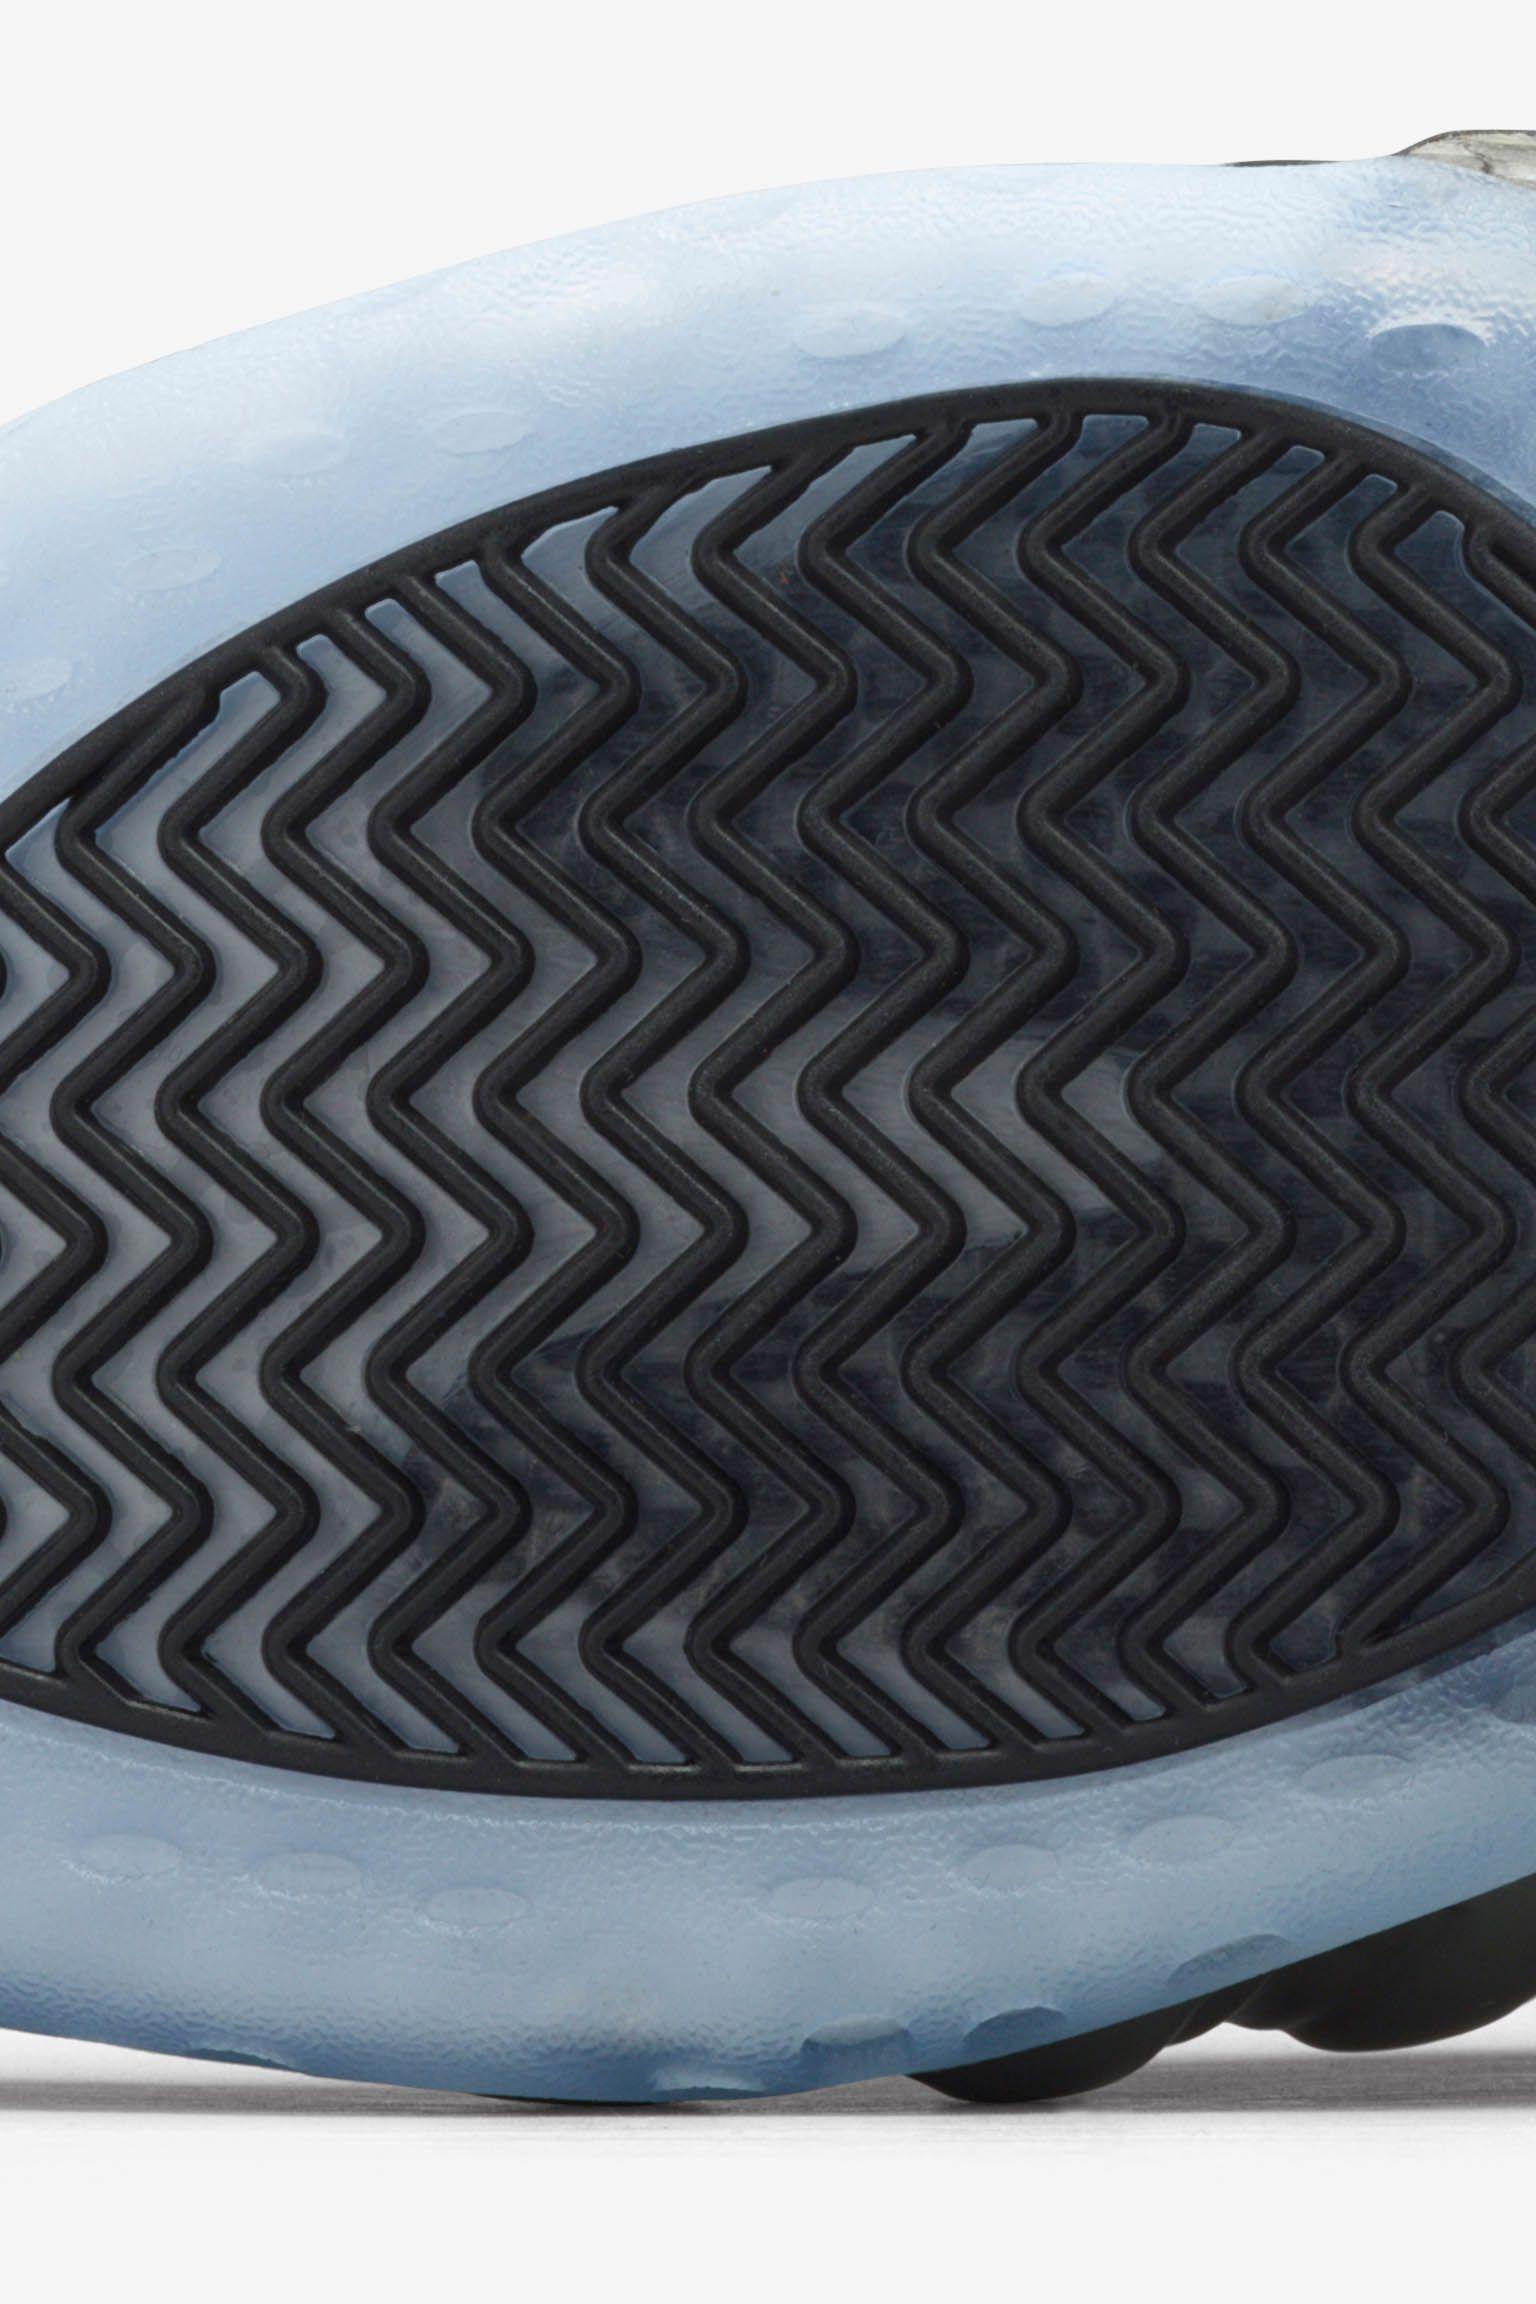 Nike Air Foamposite One 'Chromeposite' Release Date